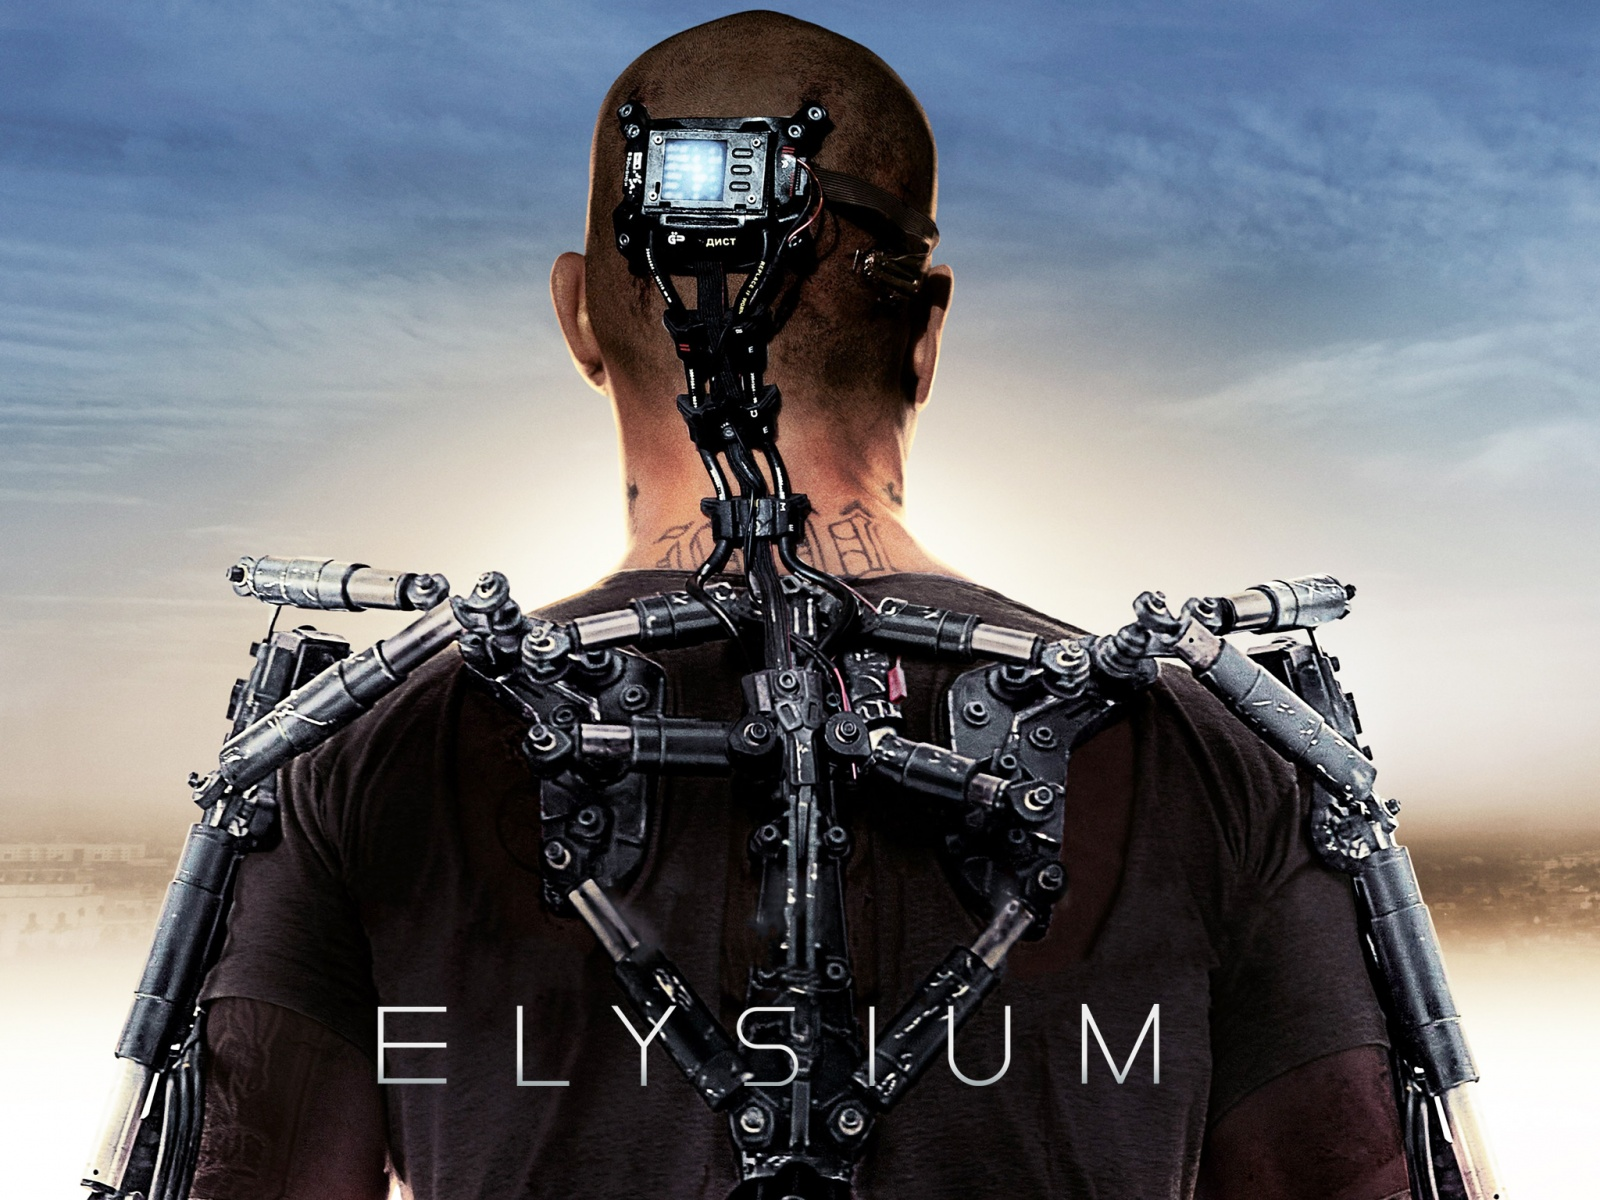 The Elysium ExoSkeleton For Real! (Video)